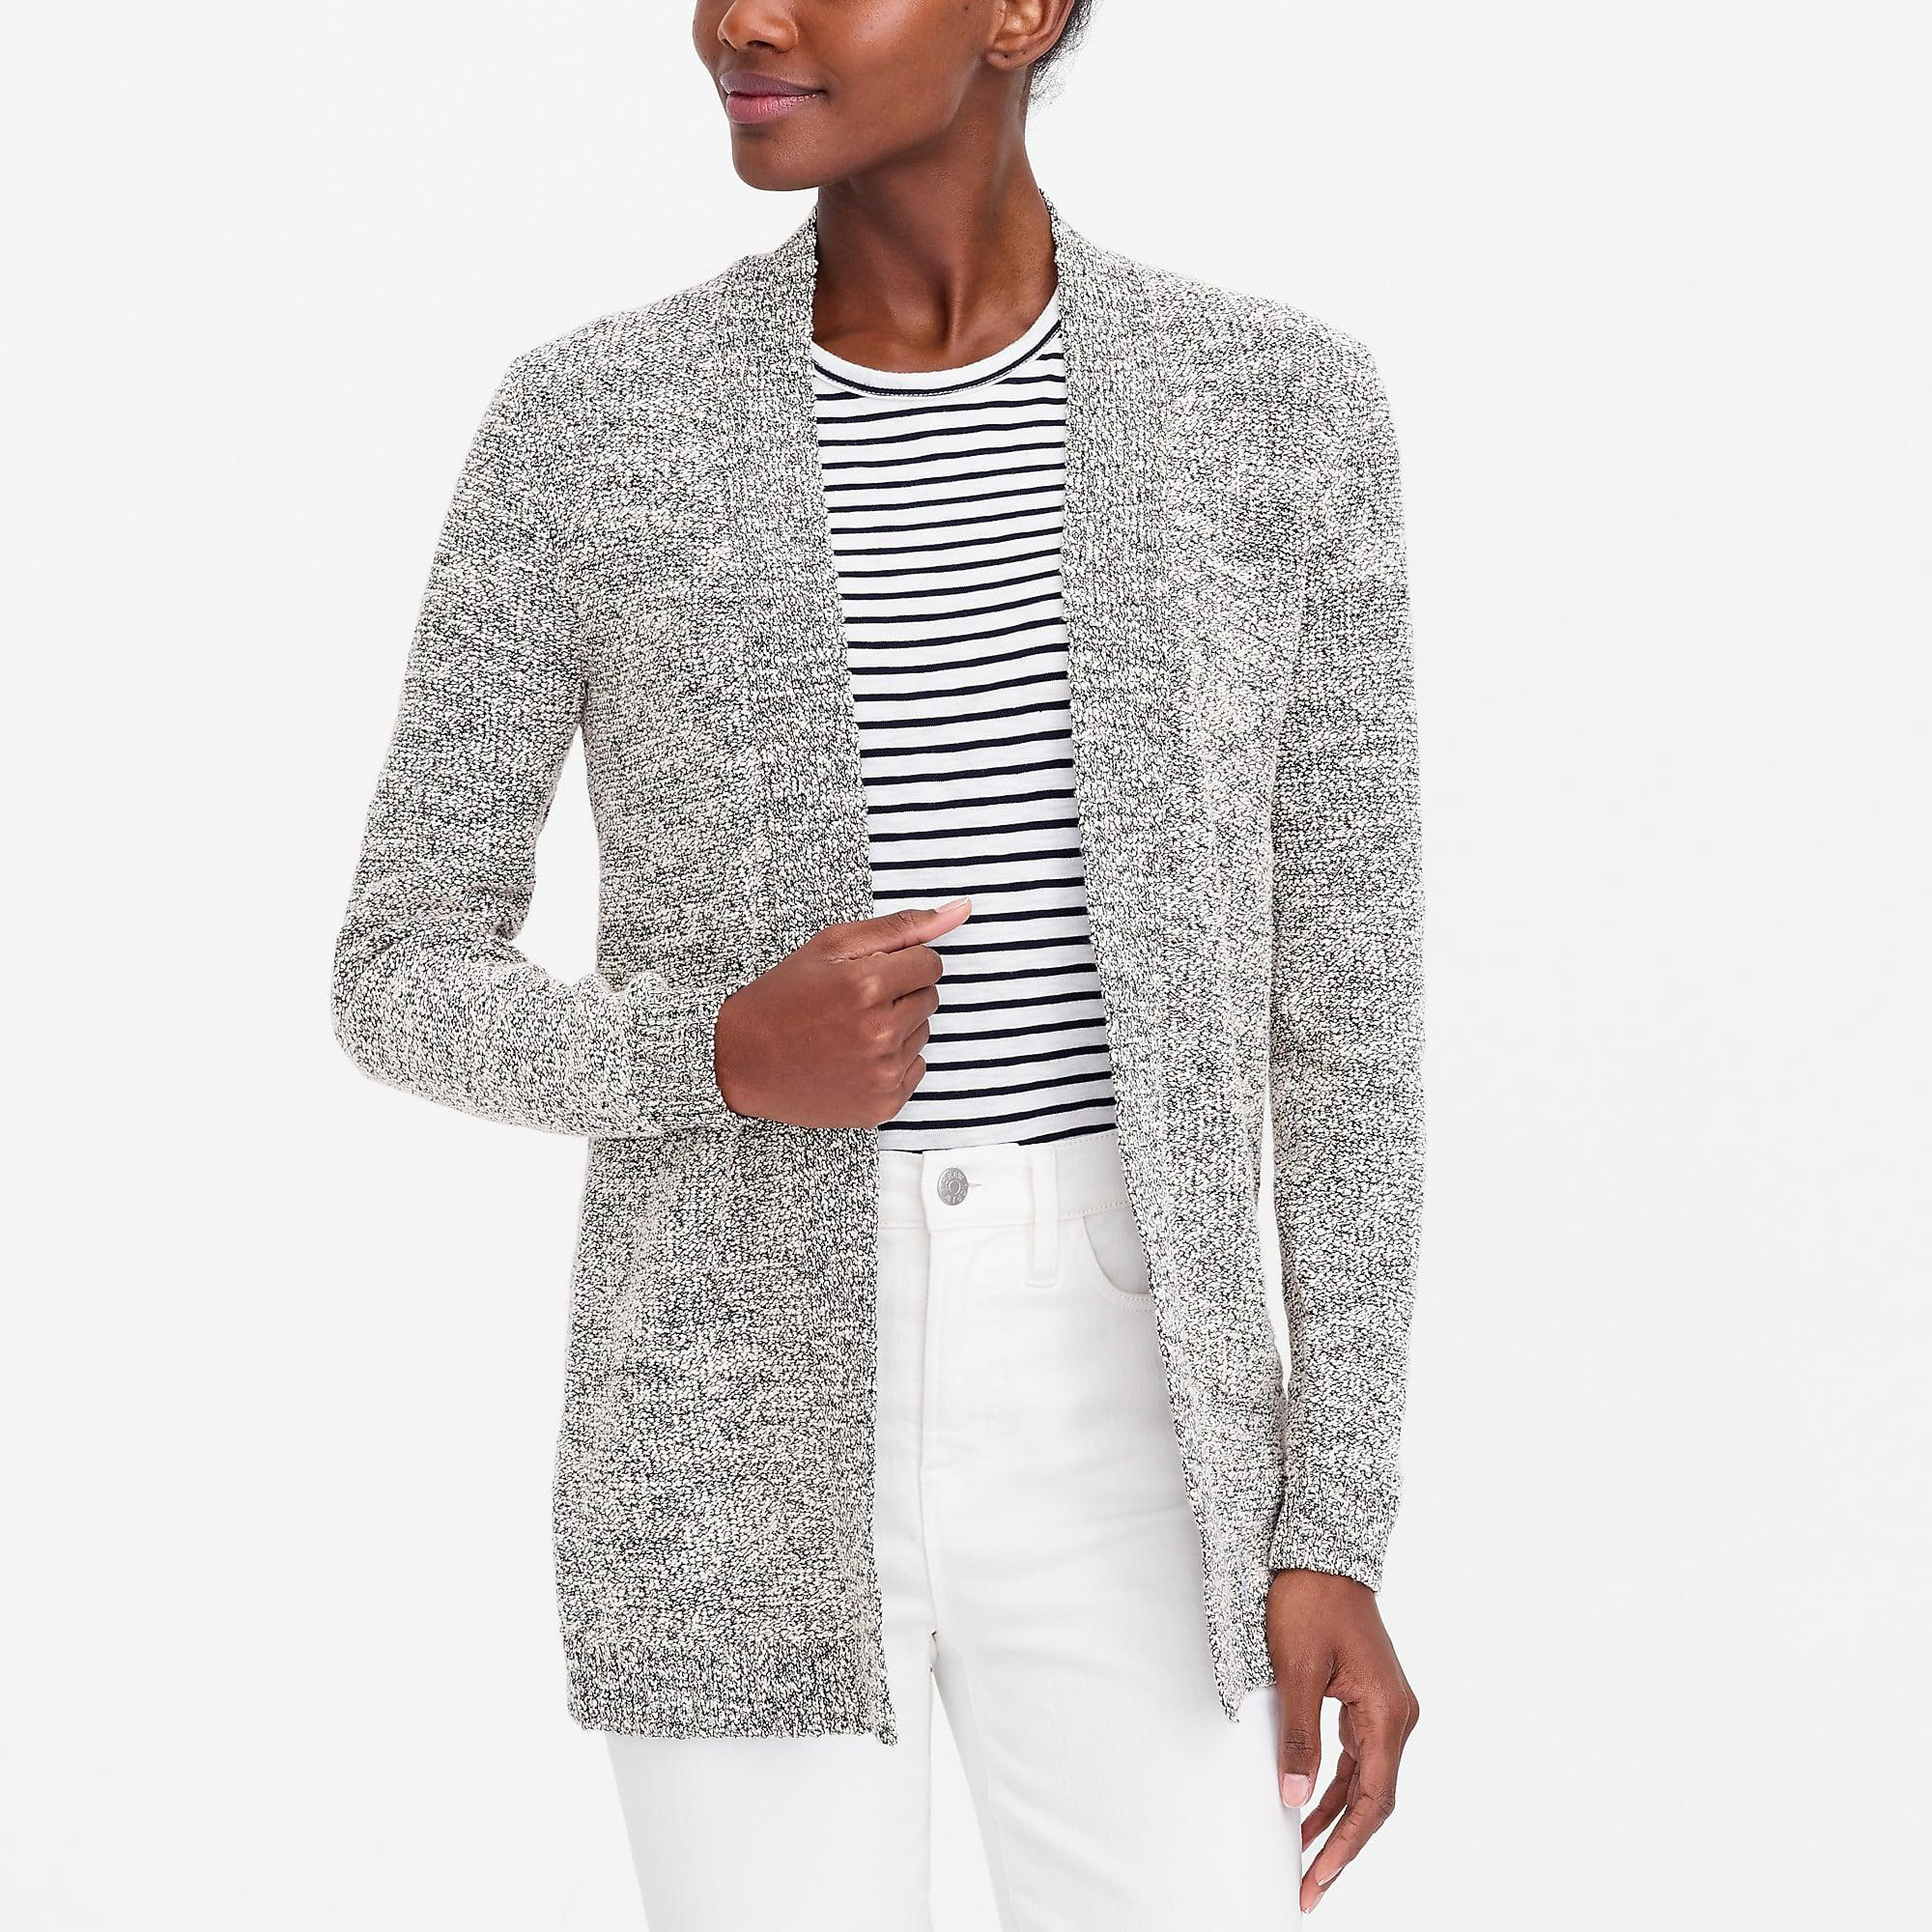 509b9dae52 Lyst - J.Crew Marled-cotton Open Cardigan Sweater